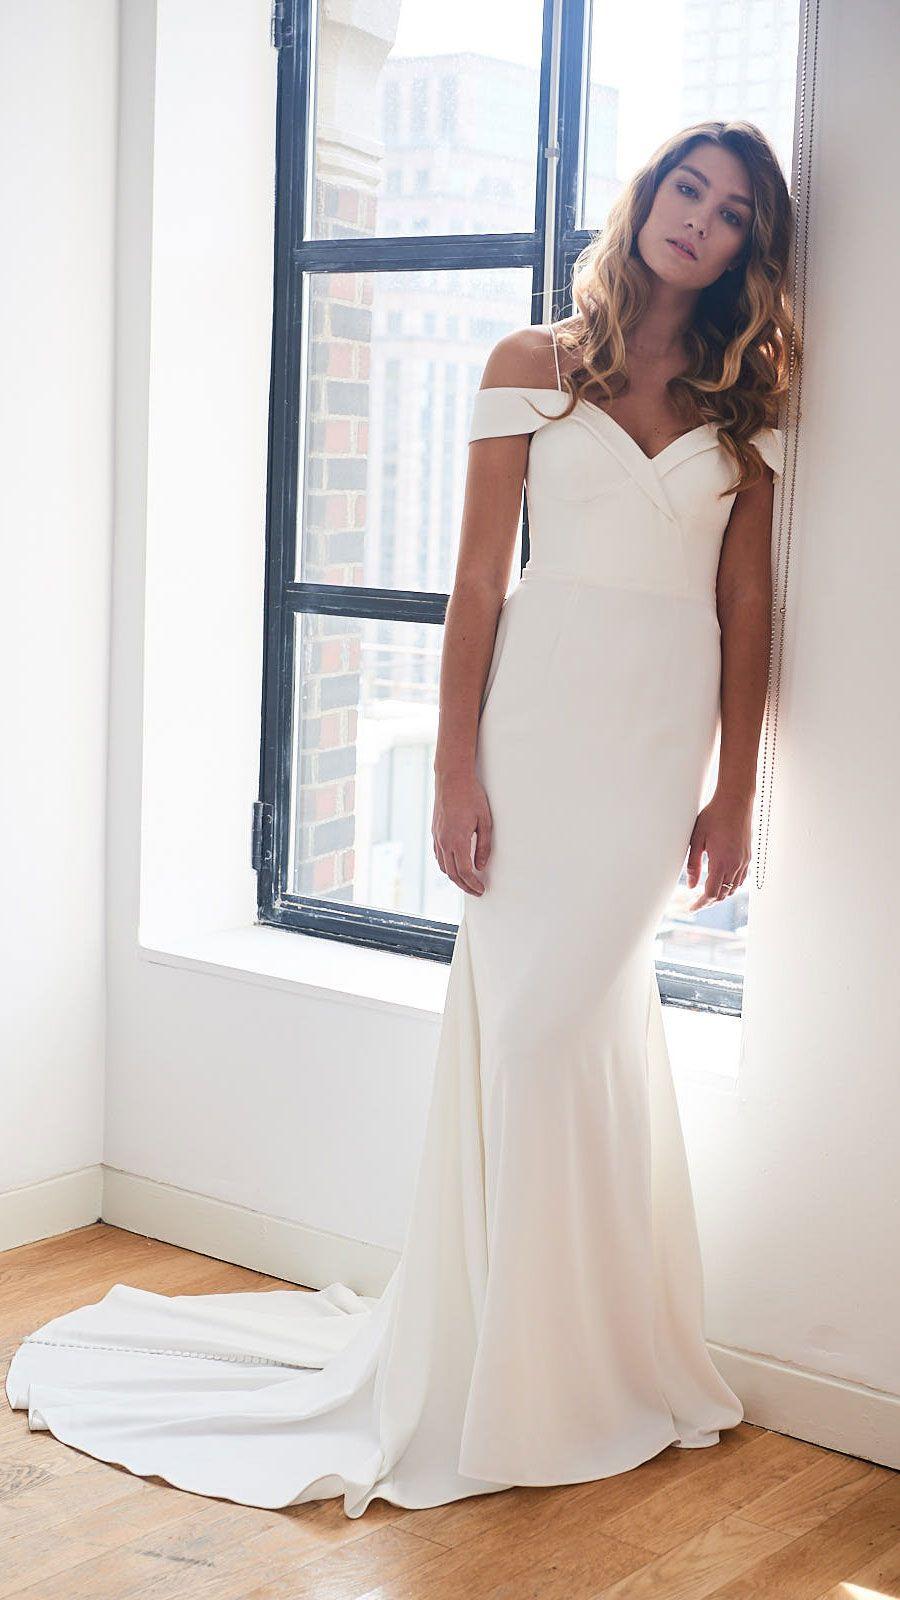 Kelly Faetanini Phoebe Crepe Fabric Wedding Dress Kelly Faetanini Wedding Dresses Crepe Wedding Dress Off Shoulder Wedding Dress [ 1600 x 900 Pixel ]